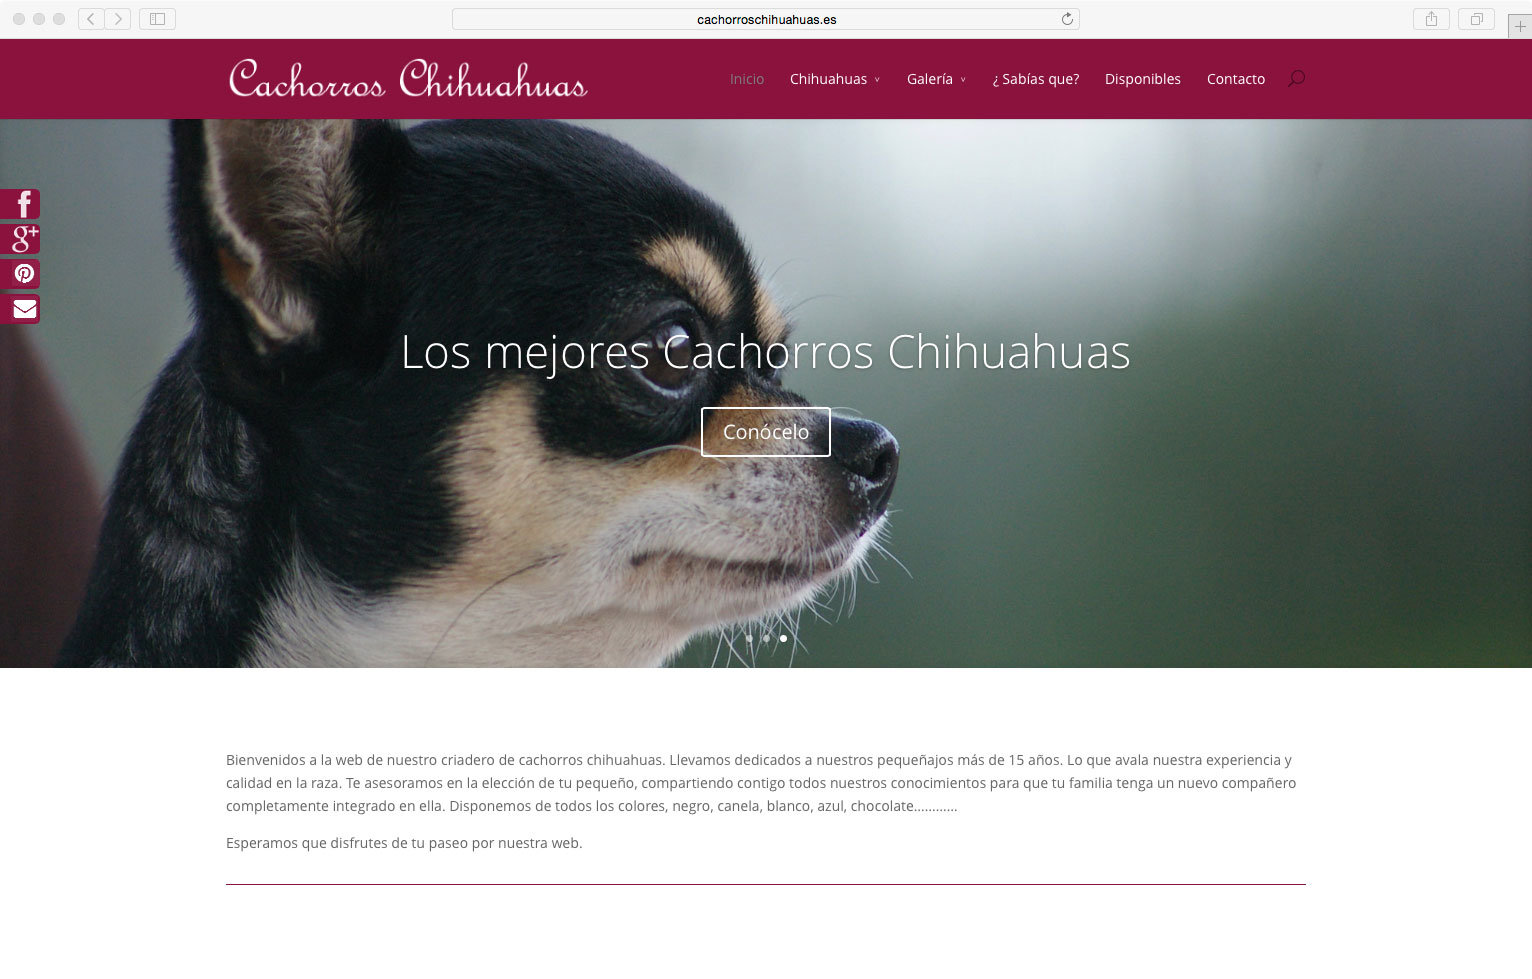 wellaggio diseño web valencia cachorros-chihuahuas